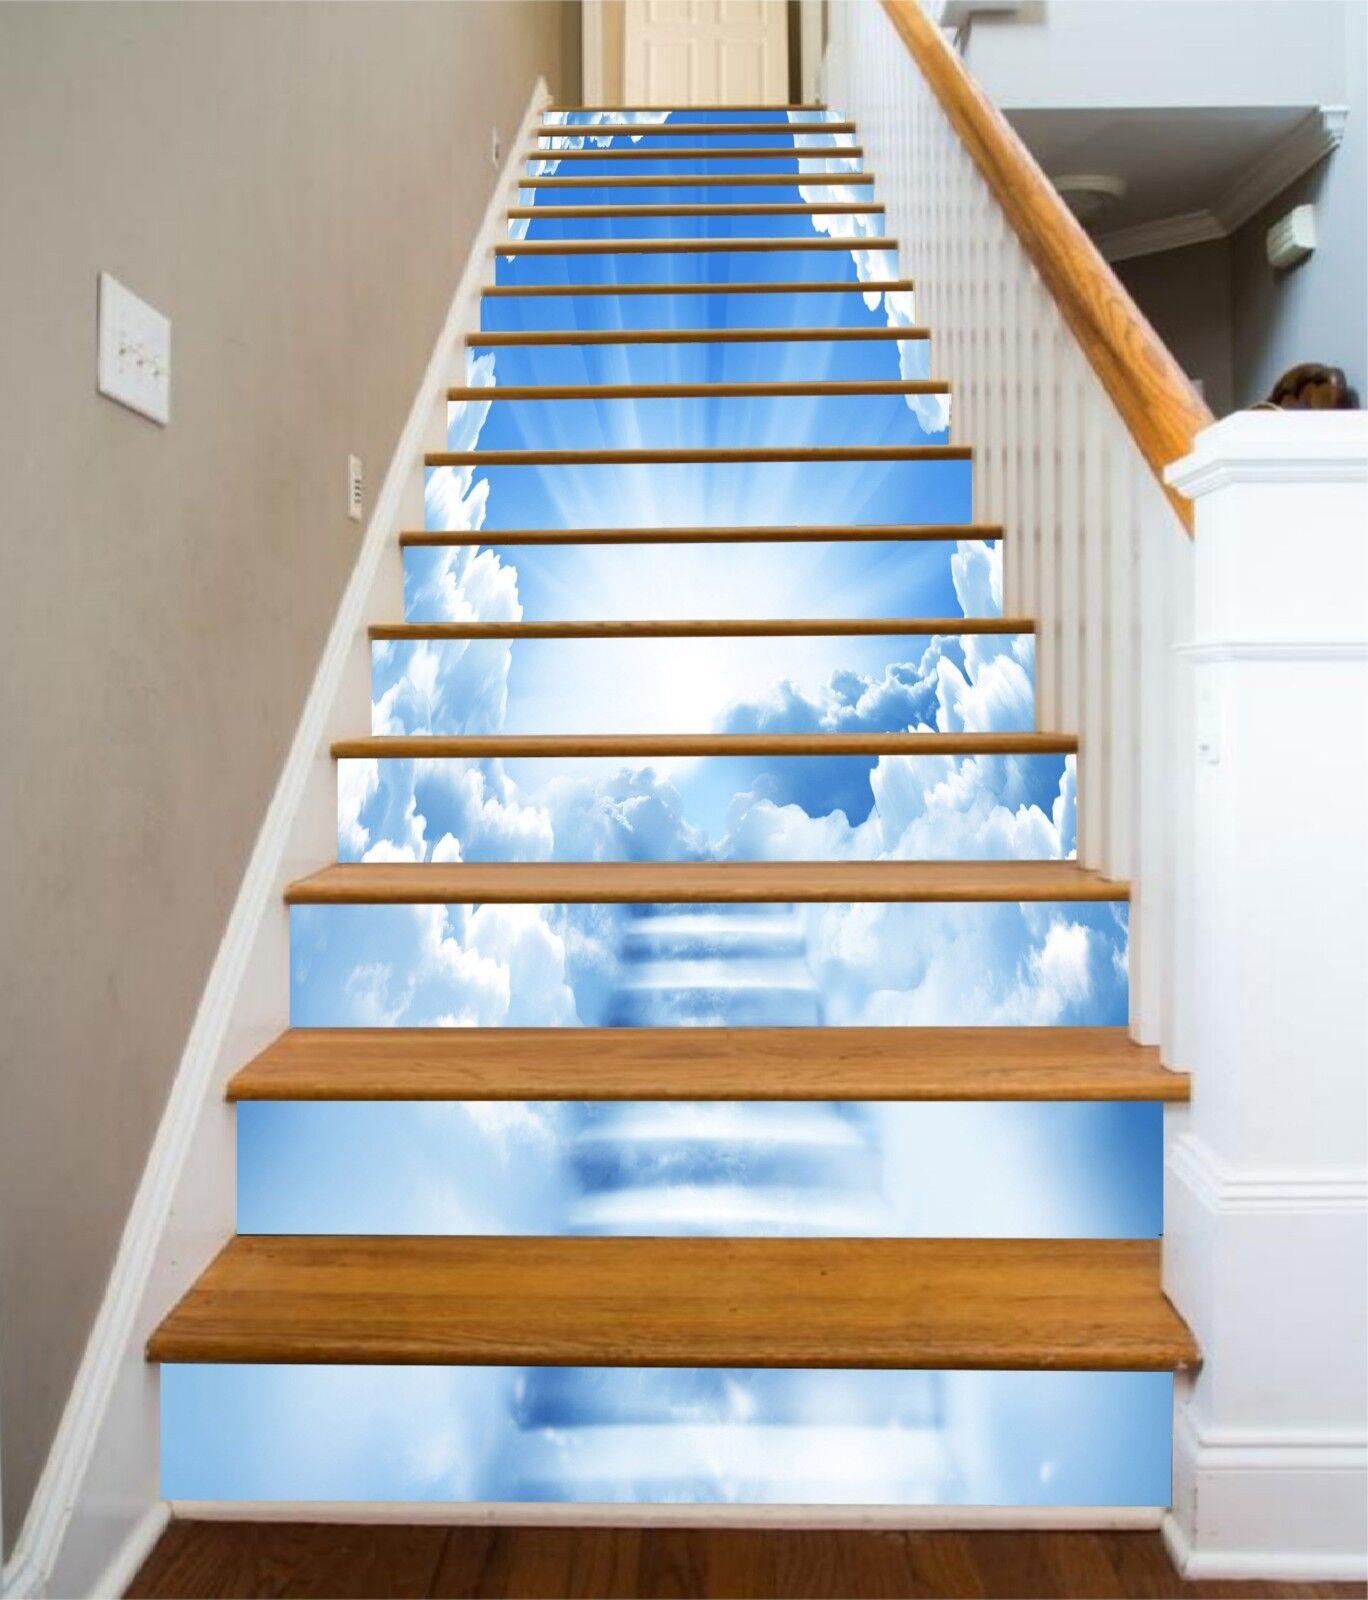 3D Waterfall View 4 Stair Risers Decoration Photo Mural Vinyl Decal Wallpaper UK